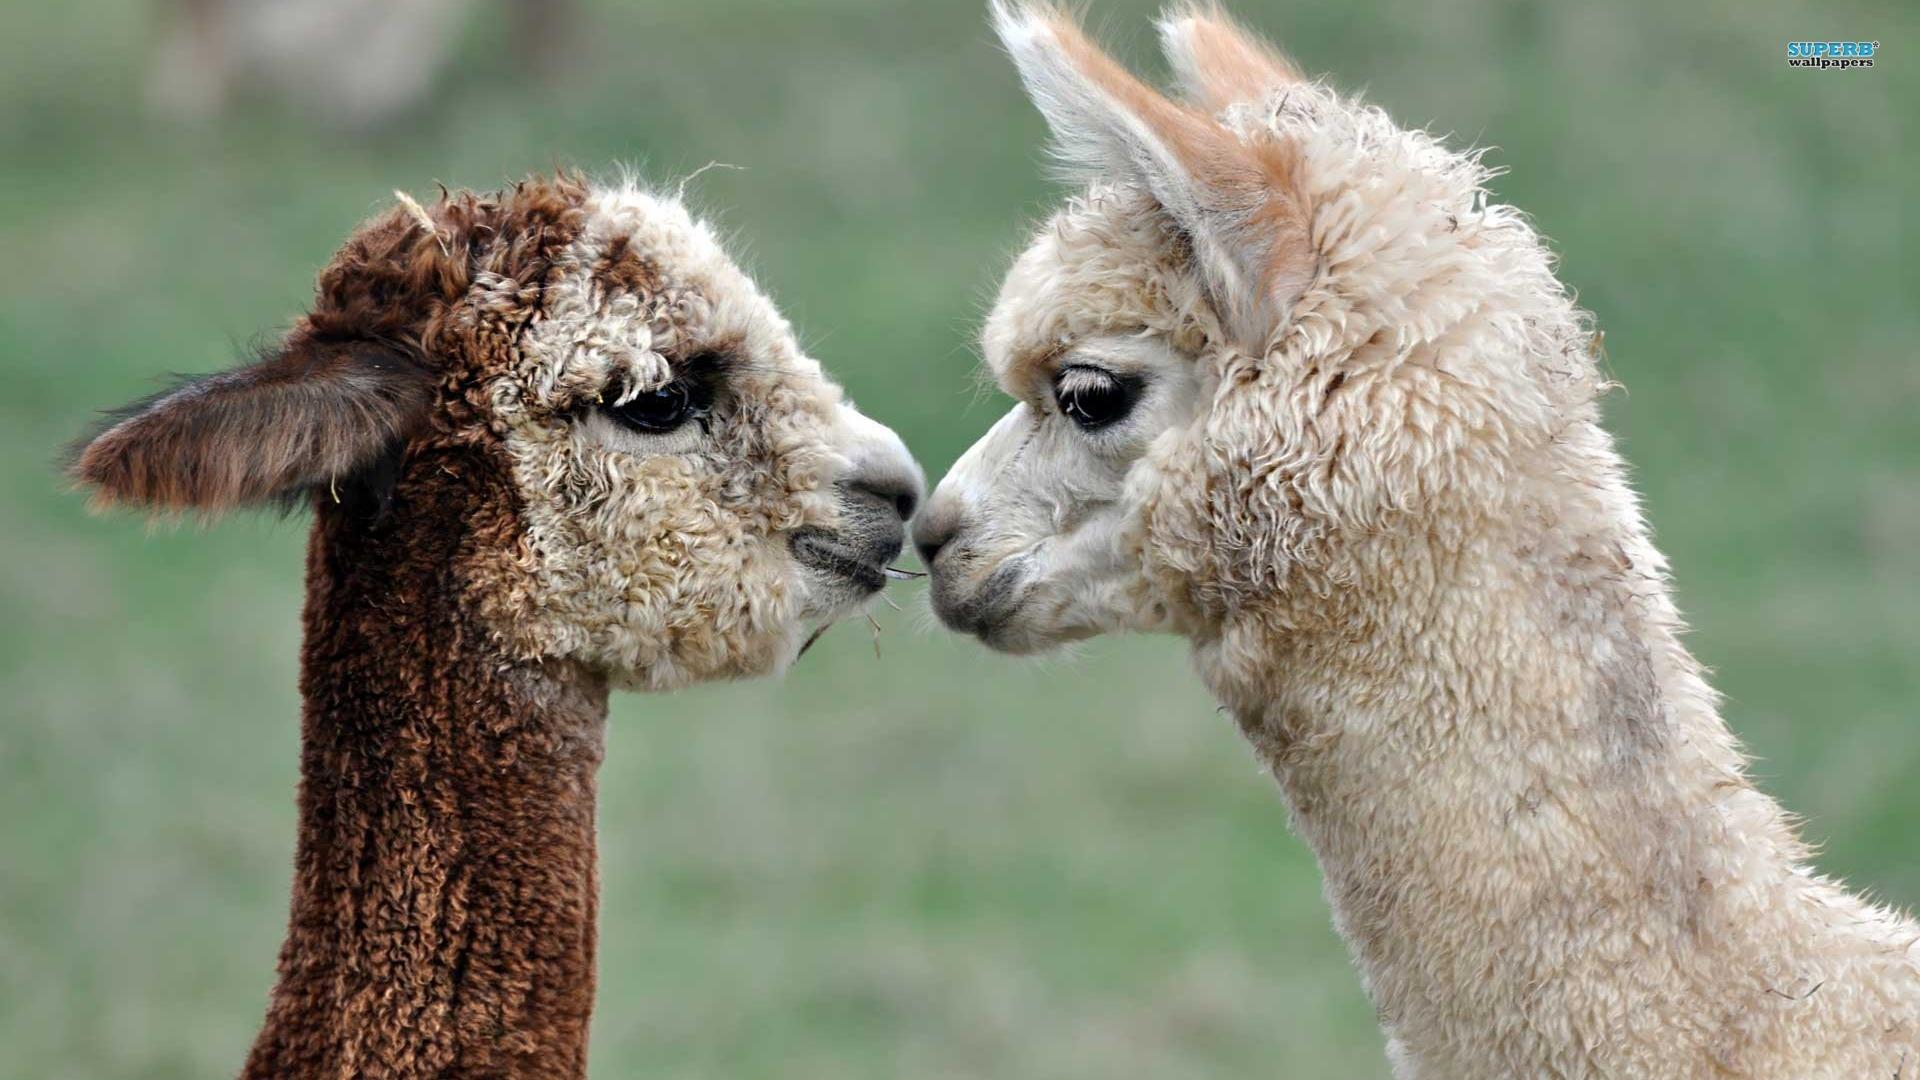 alpacas-1920%C3%971080-Seriously-Mum-Whats-an-Alpaca-wallpaper-wp3602375